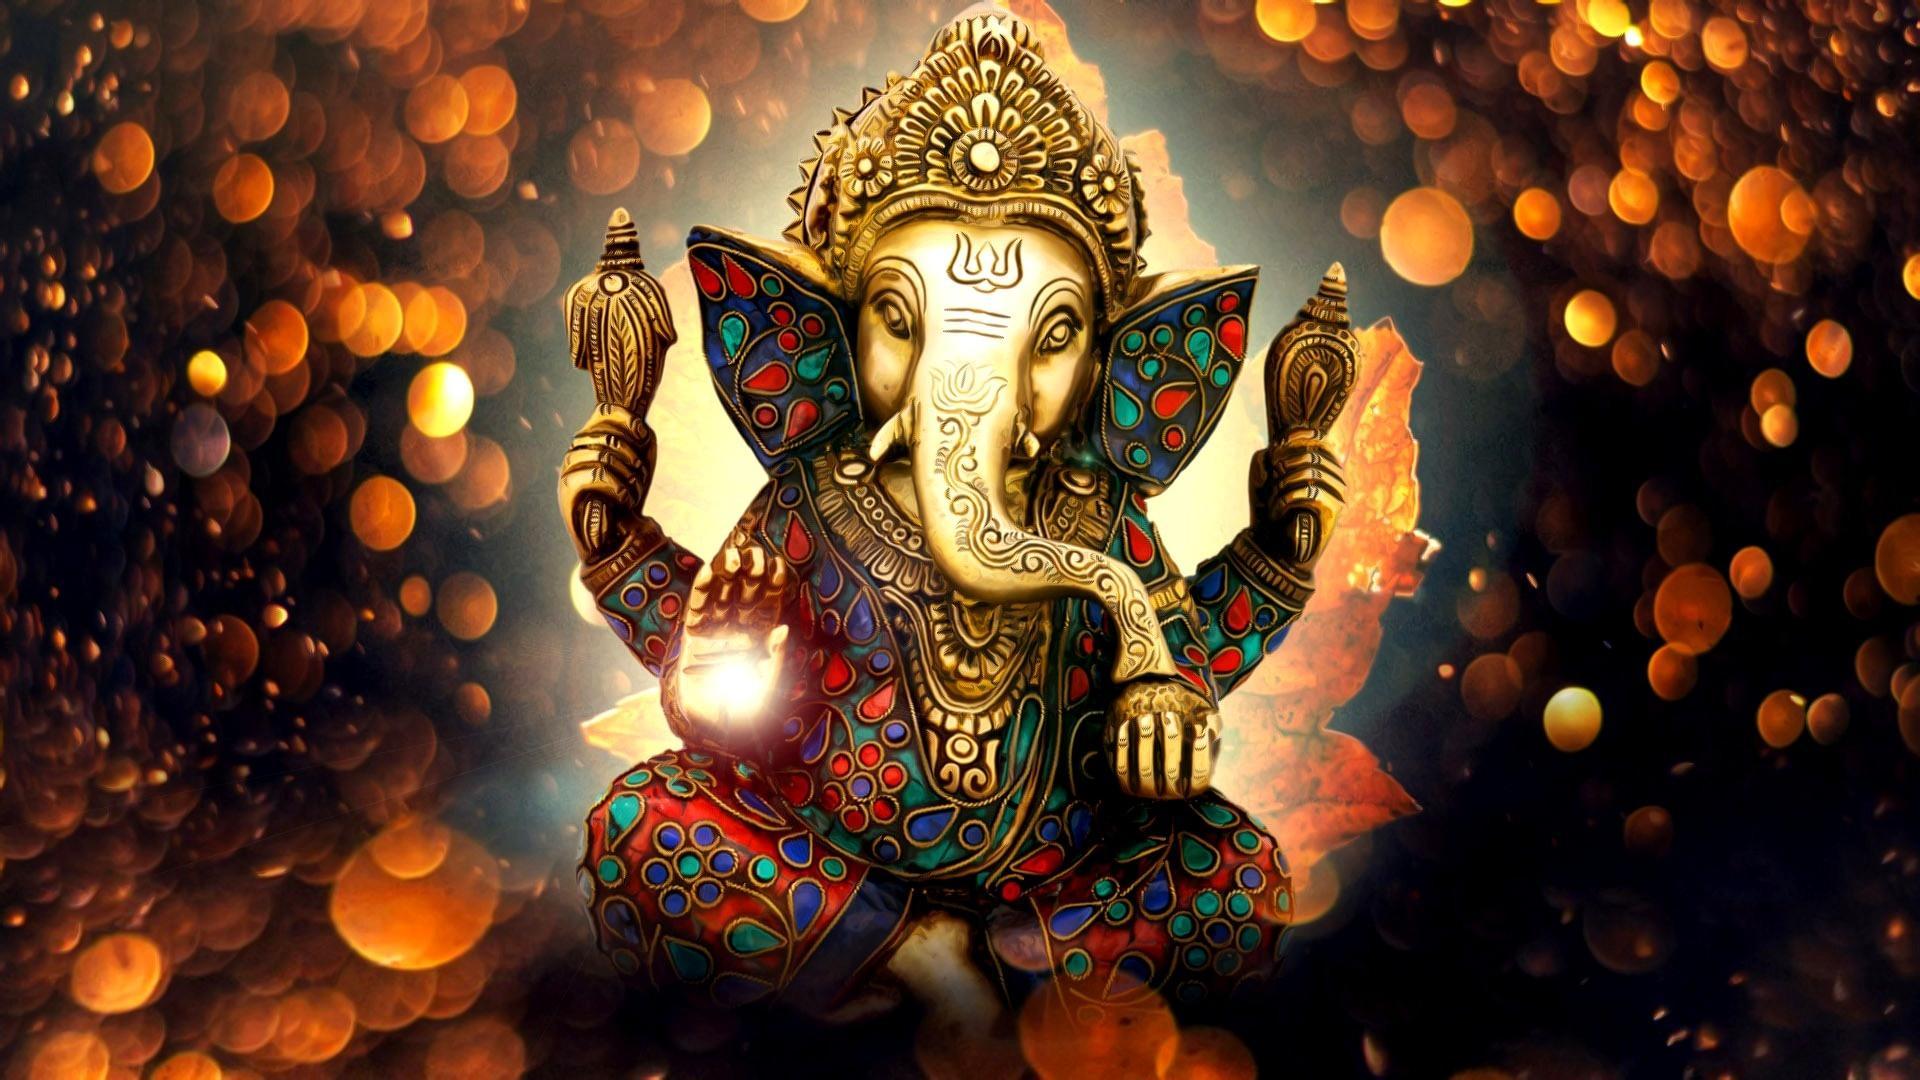 Lord Ganesha 4k Wallpapers Wallpaper Cave